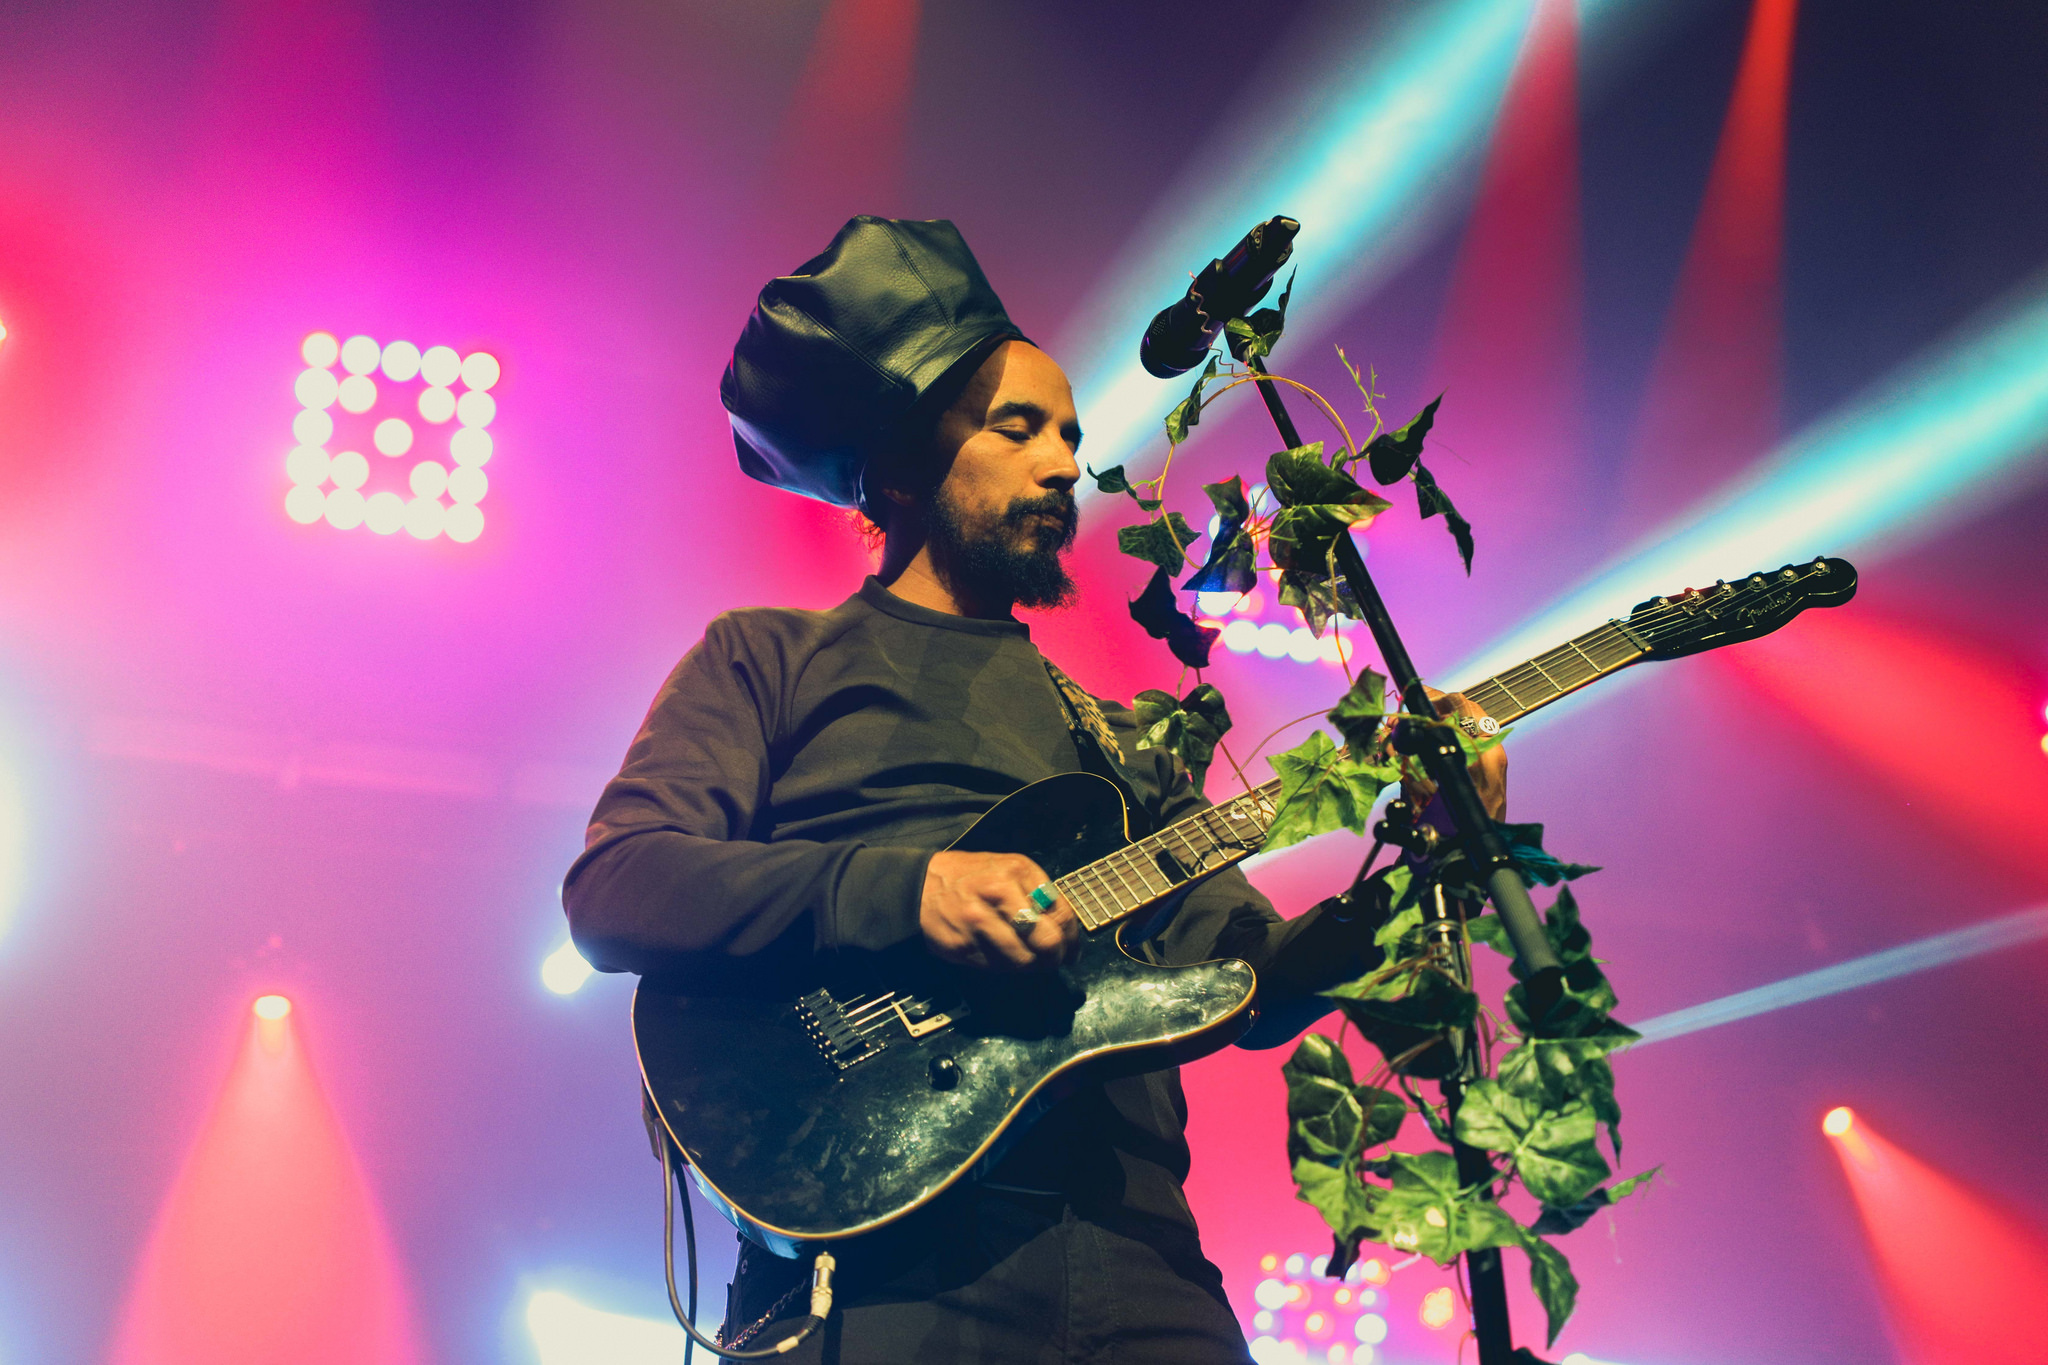 Alerta, reggae, cumbia, ritmo y Kamarada - 7